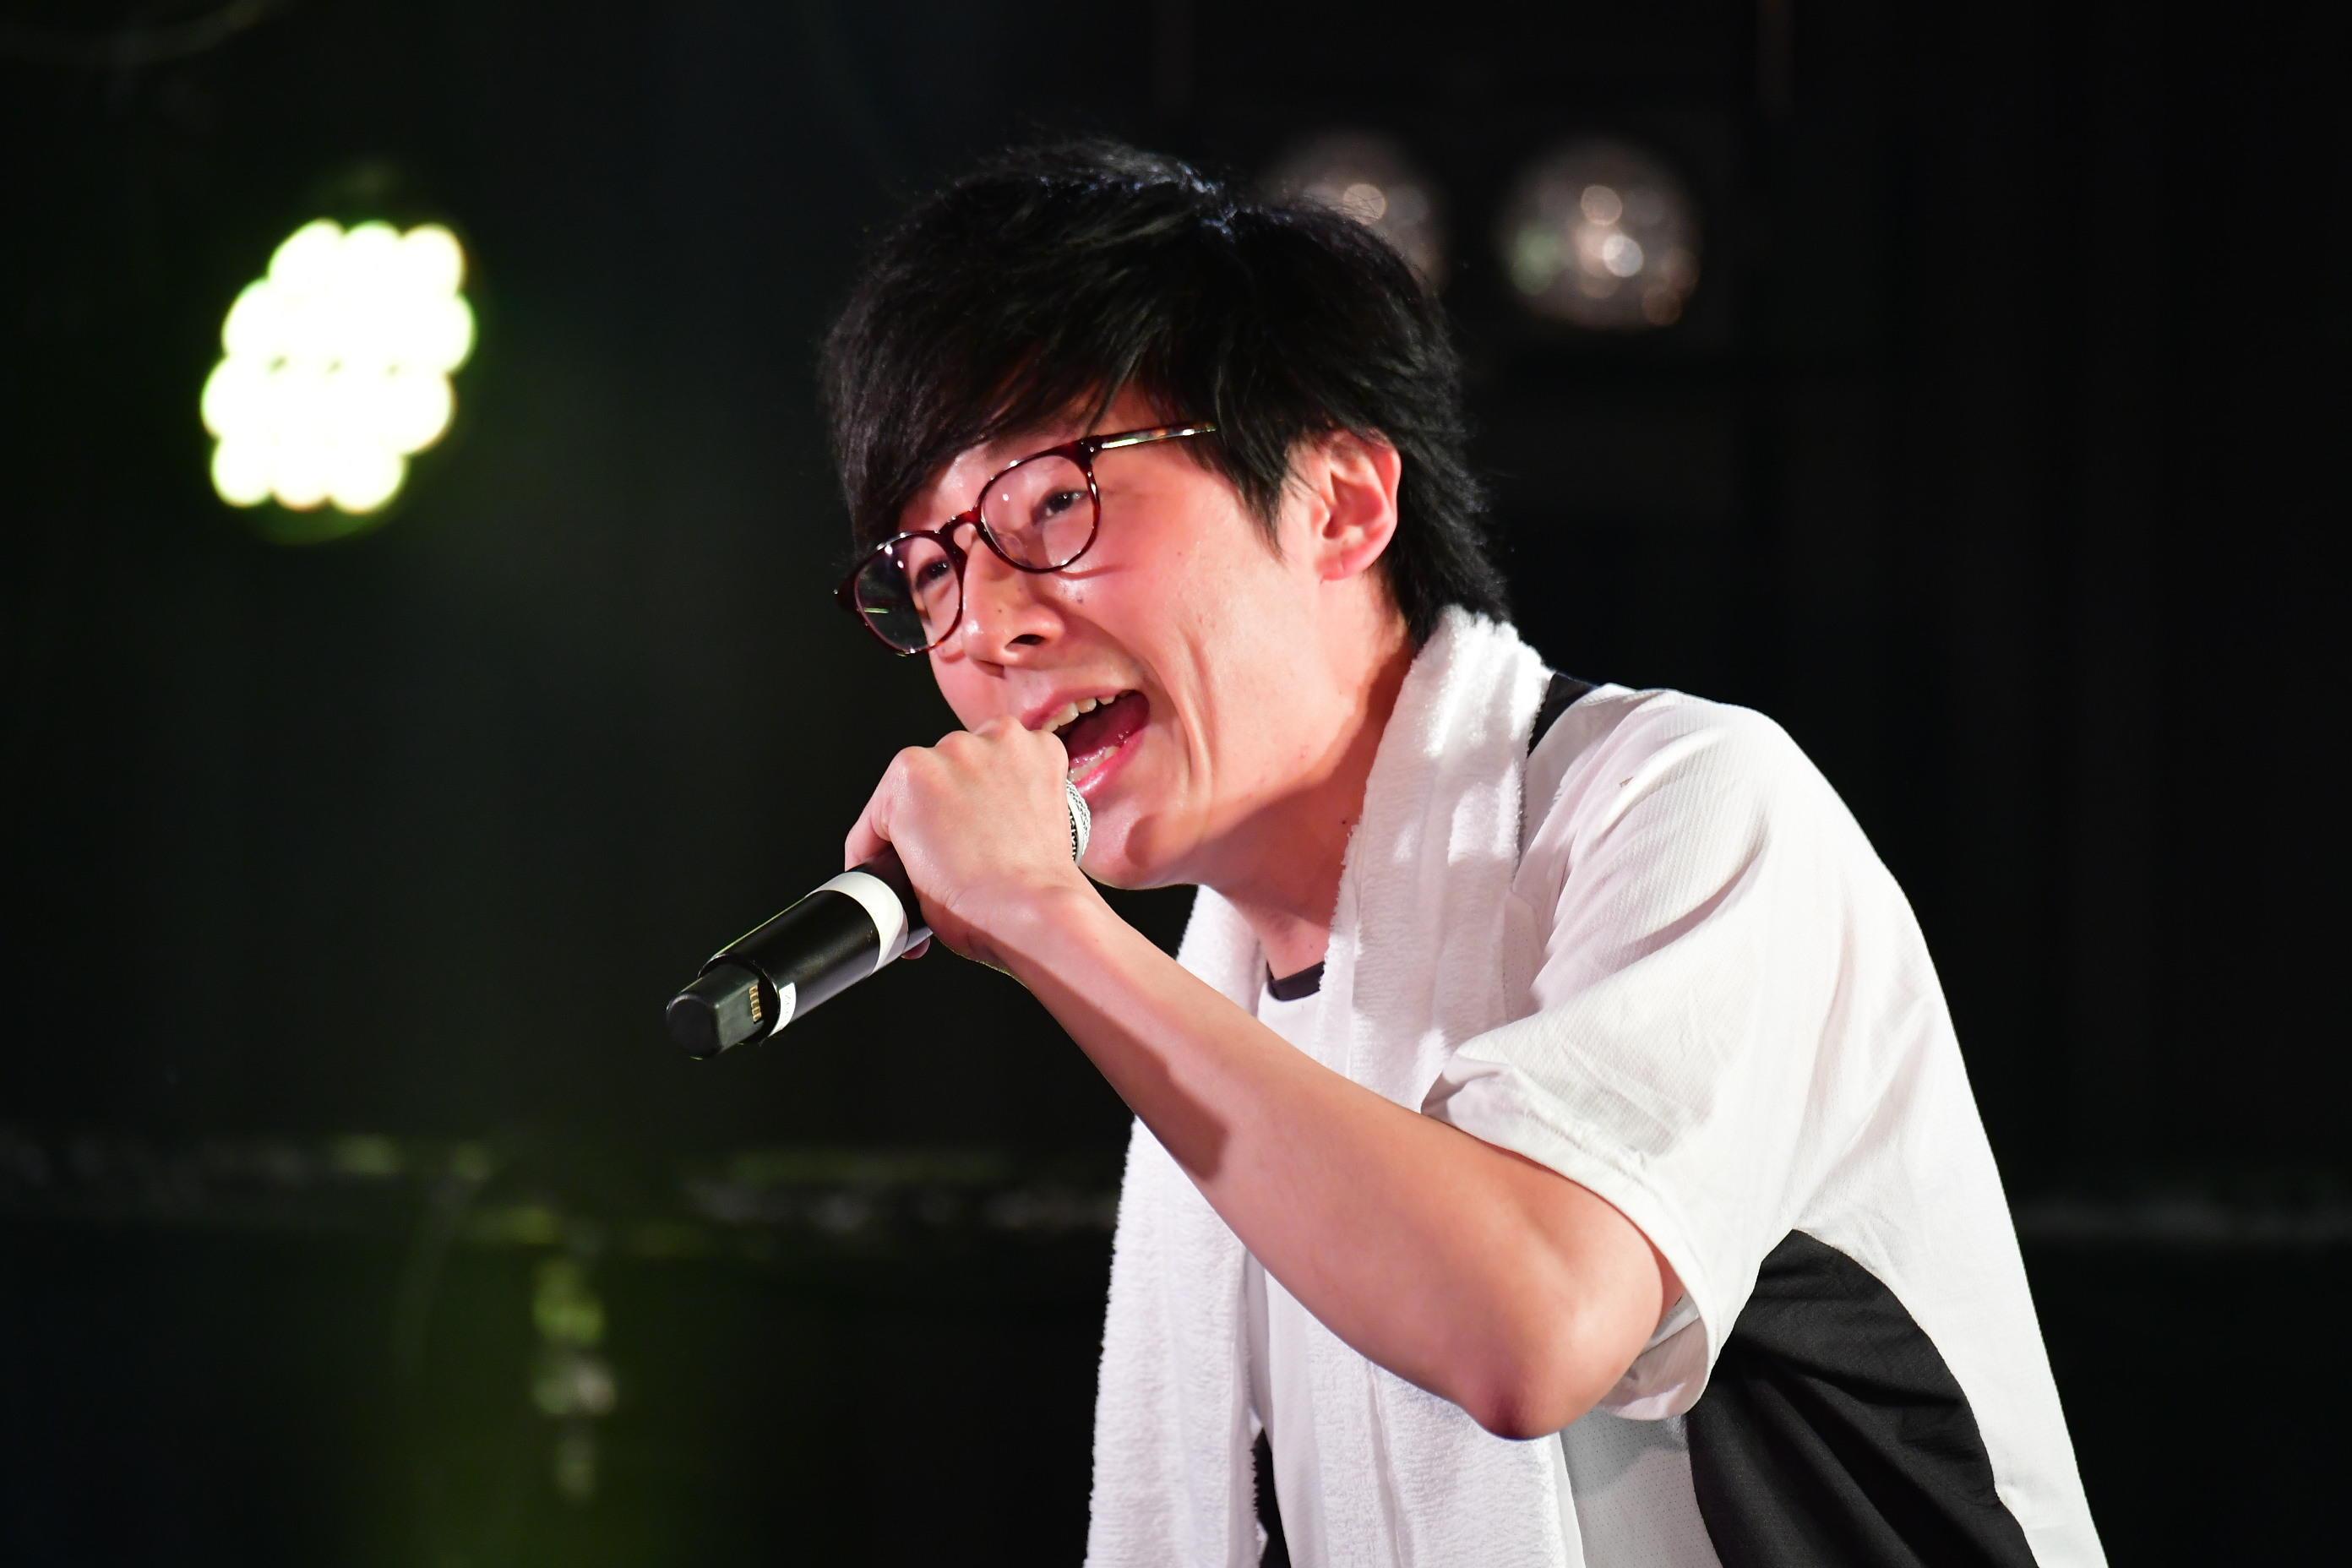 http://news.yoshimoto.co.jp/20180430220405-38f2ddd1f7a0e459ac89446d6fffeb70bd9dc9b5.jpg